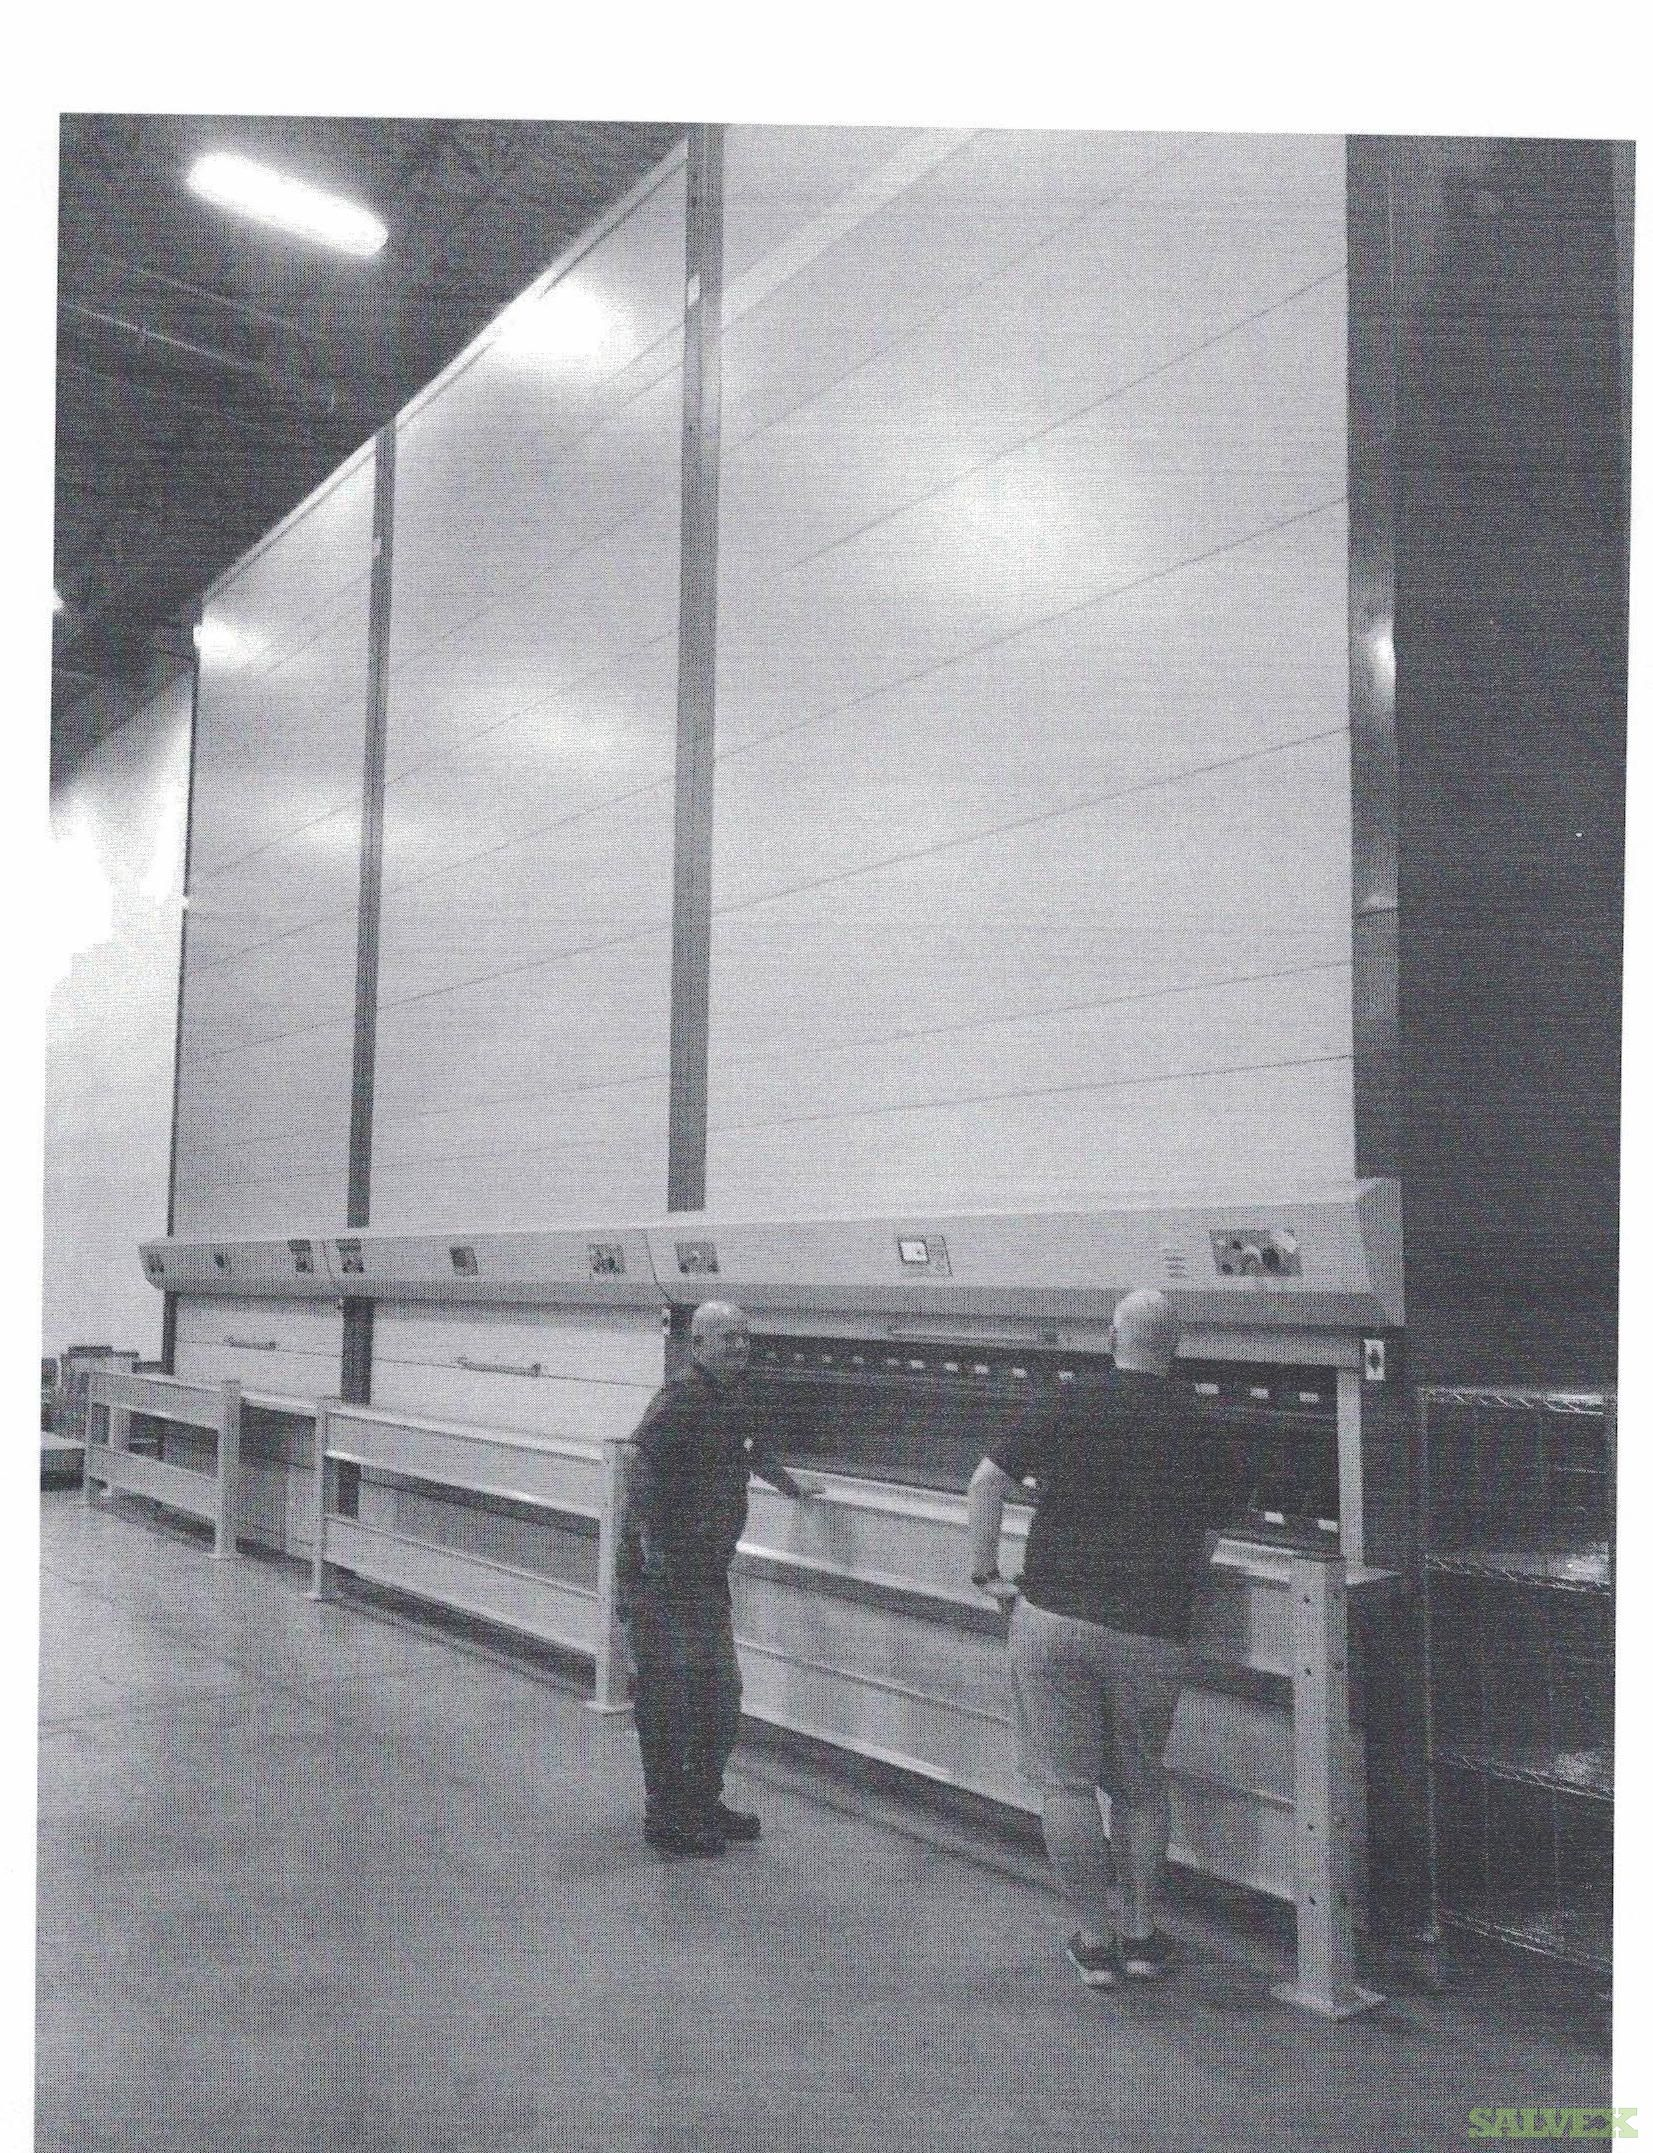 Remstar 350W-34-14 Vertical Carousel Equipment  (1 unit)